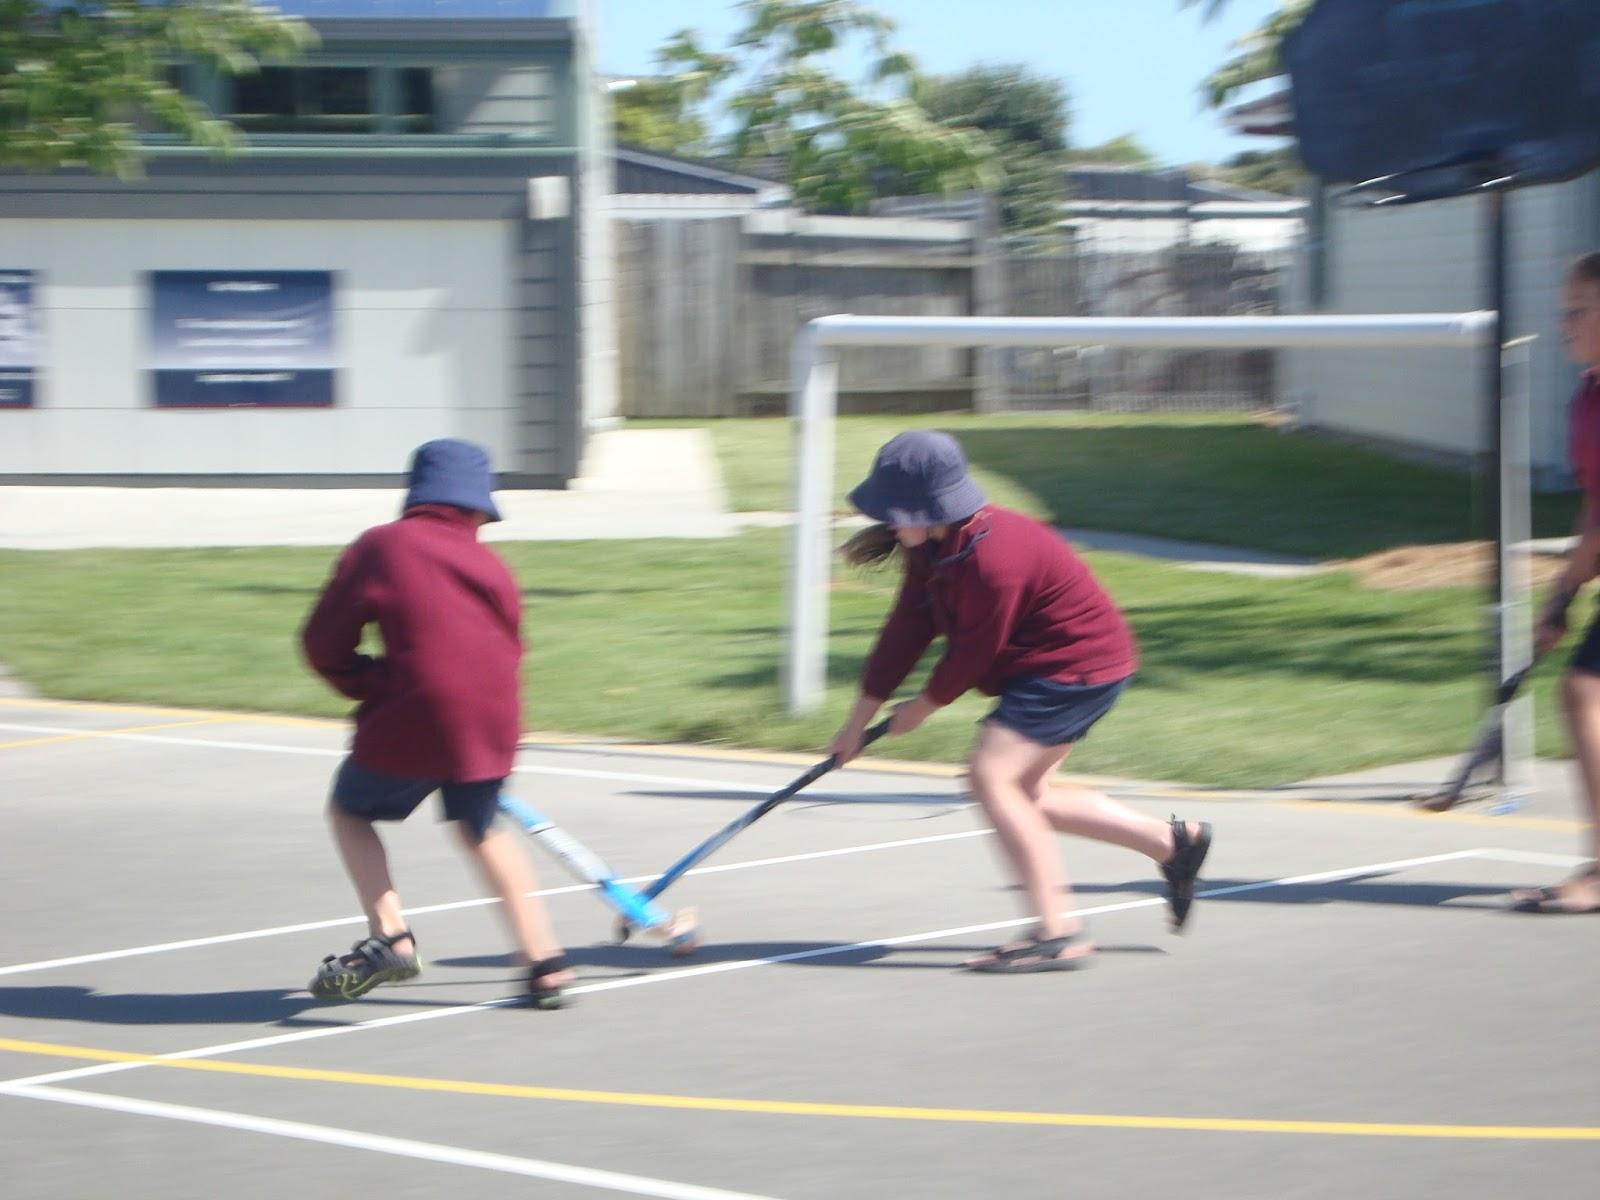 Incredible Cornerstone Kids: Developing our hockey skills